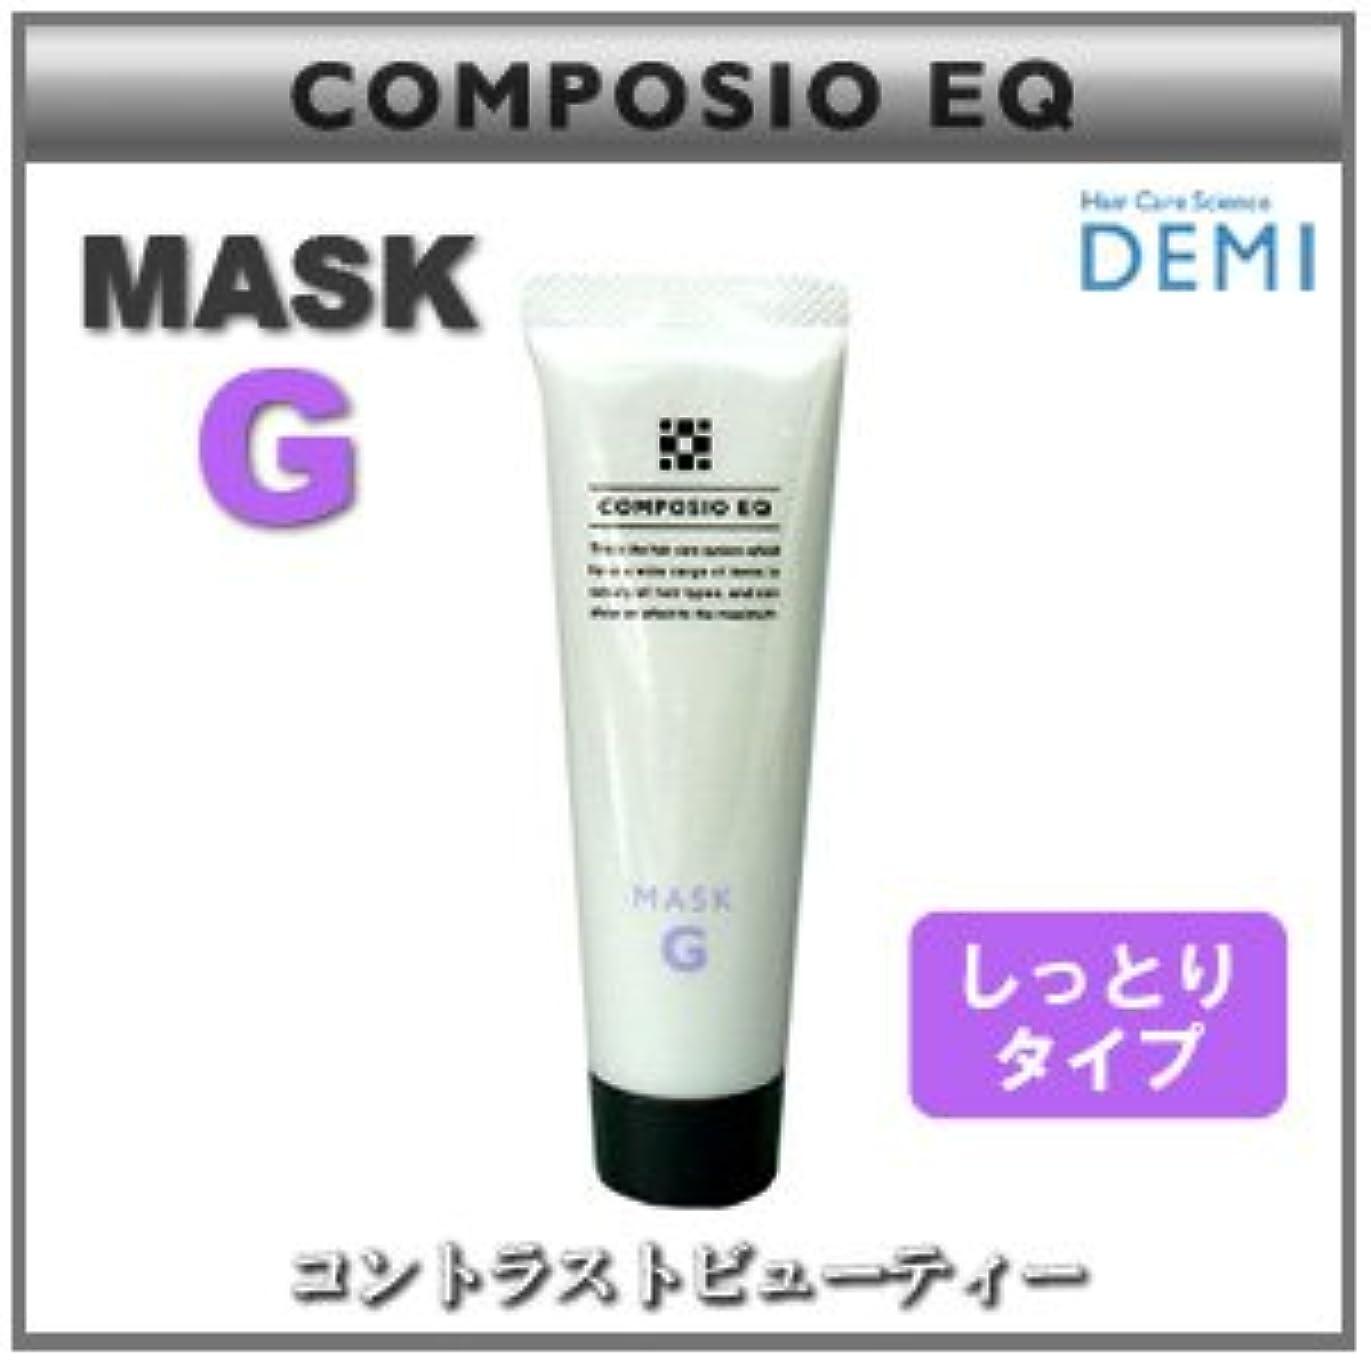 【X2個セット】 デミ コンポジオ EQ マスク G 50g